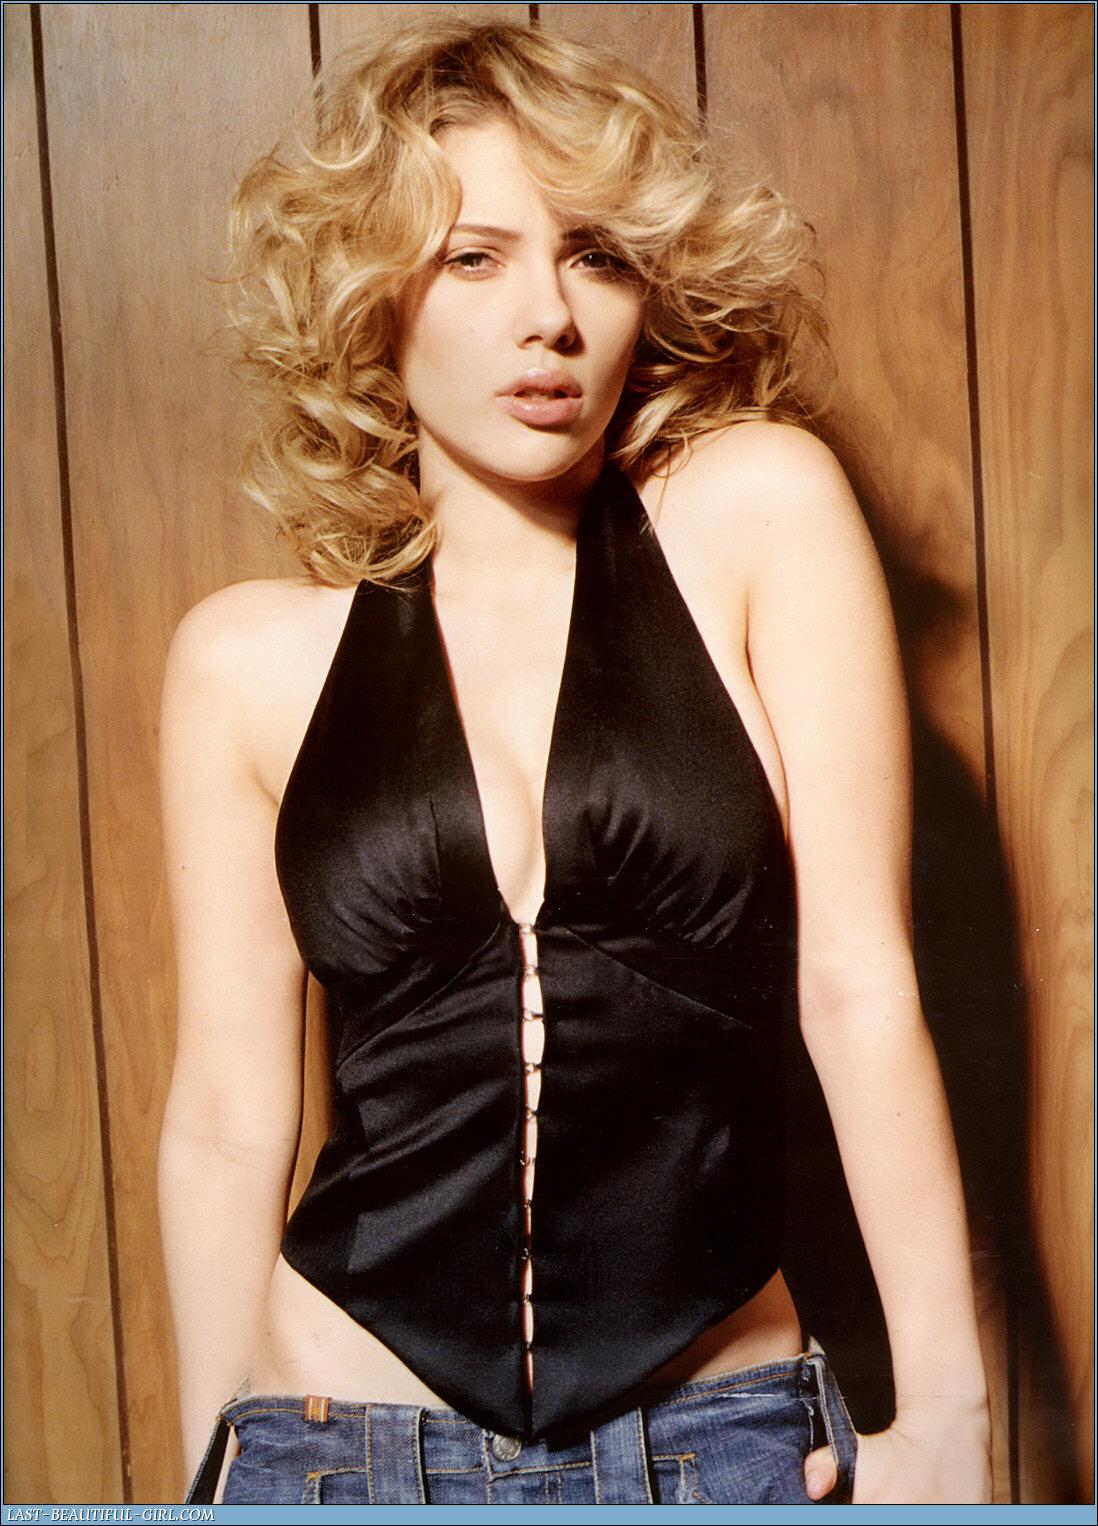 Scarlett johansson special pictures 16 film actresses - Scarlett johansson blogspot ...